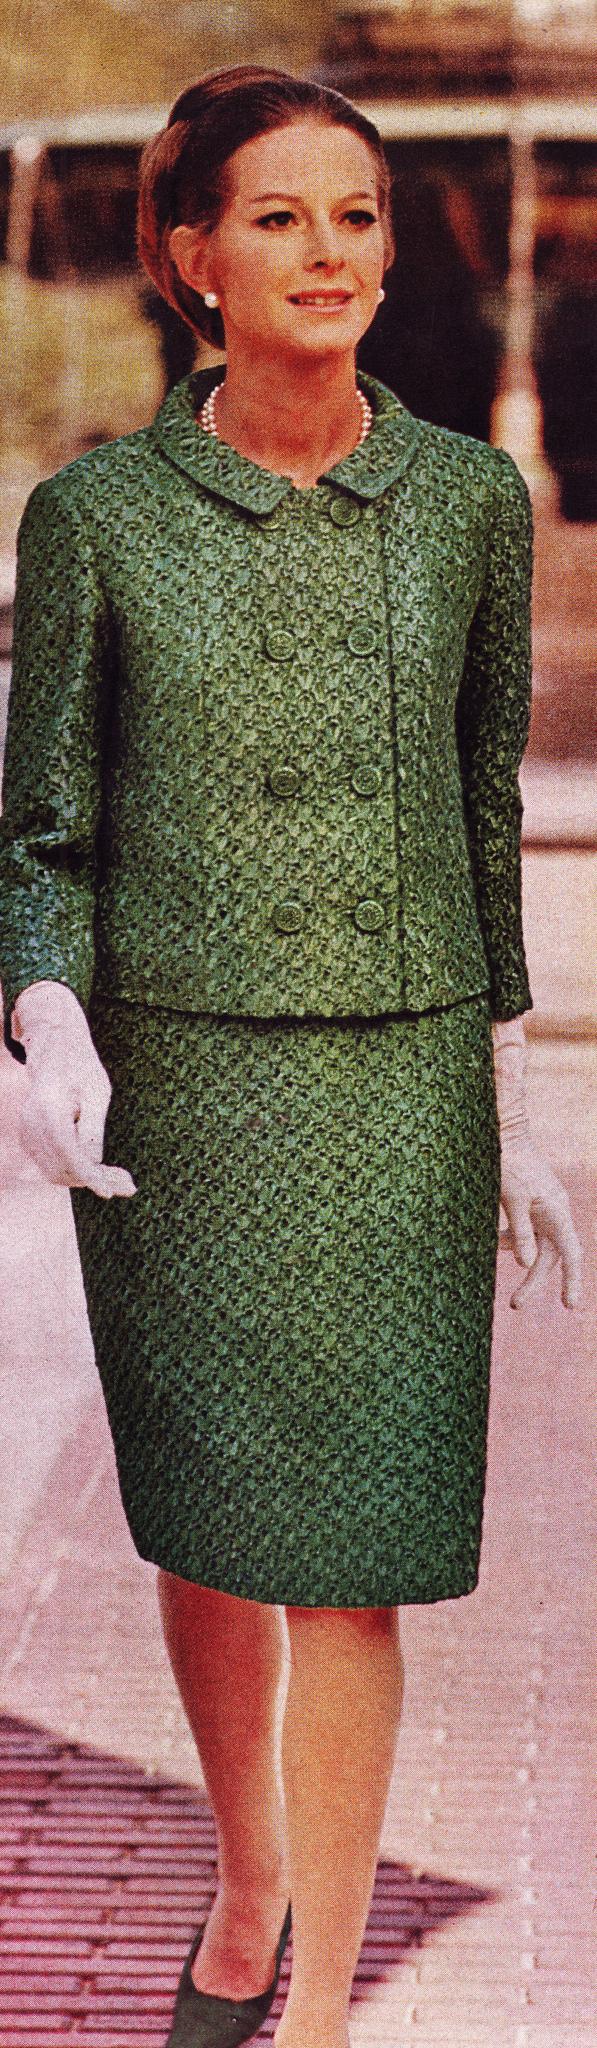 https://flic.kr/p/kL5ZYW   McCalls ss 70 green knitted